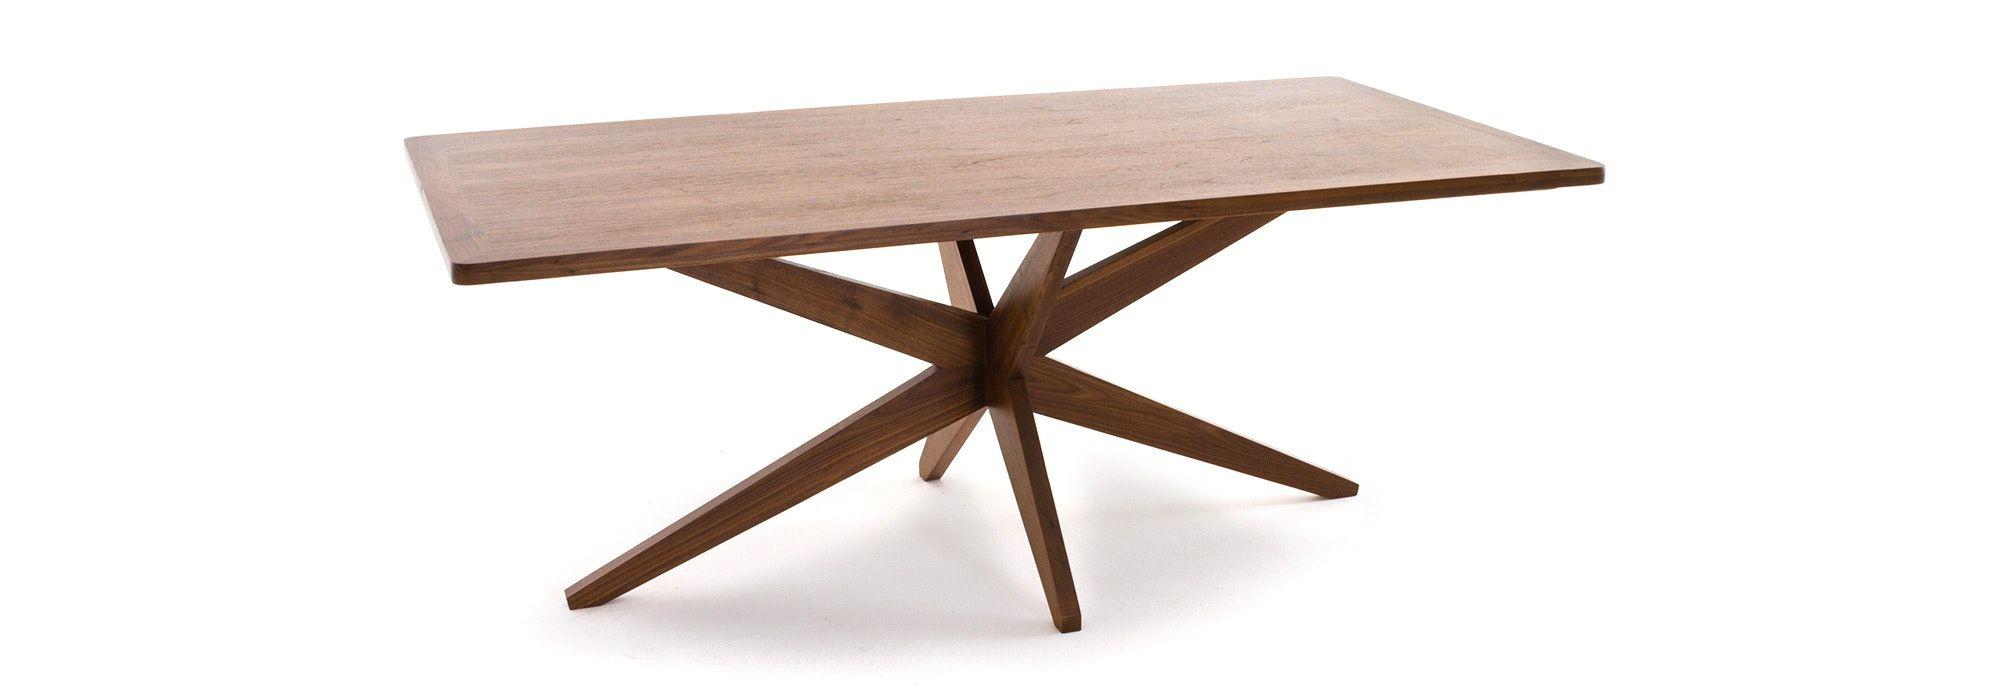 Jax Dining Table Joybird Round Dining Table Modern Mid